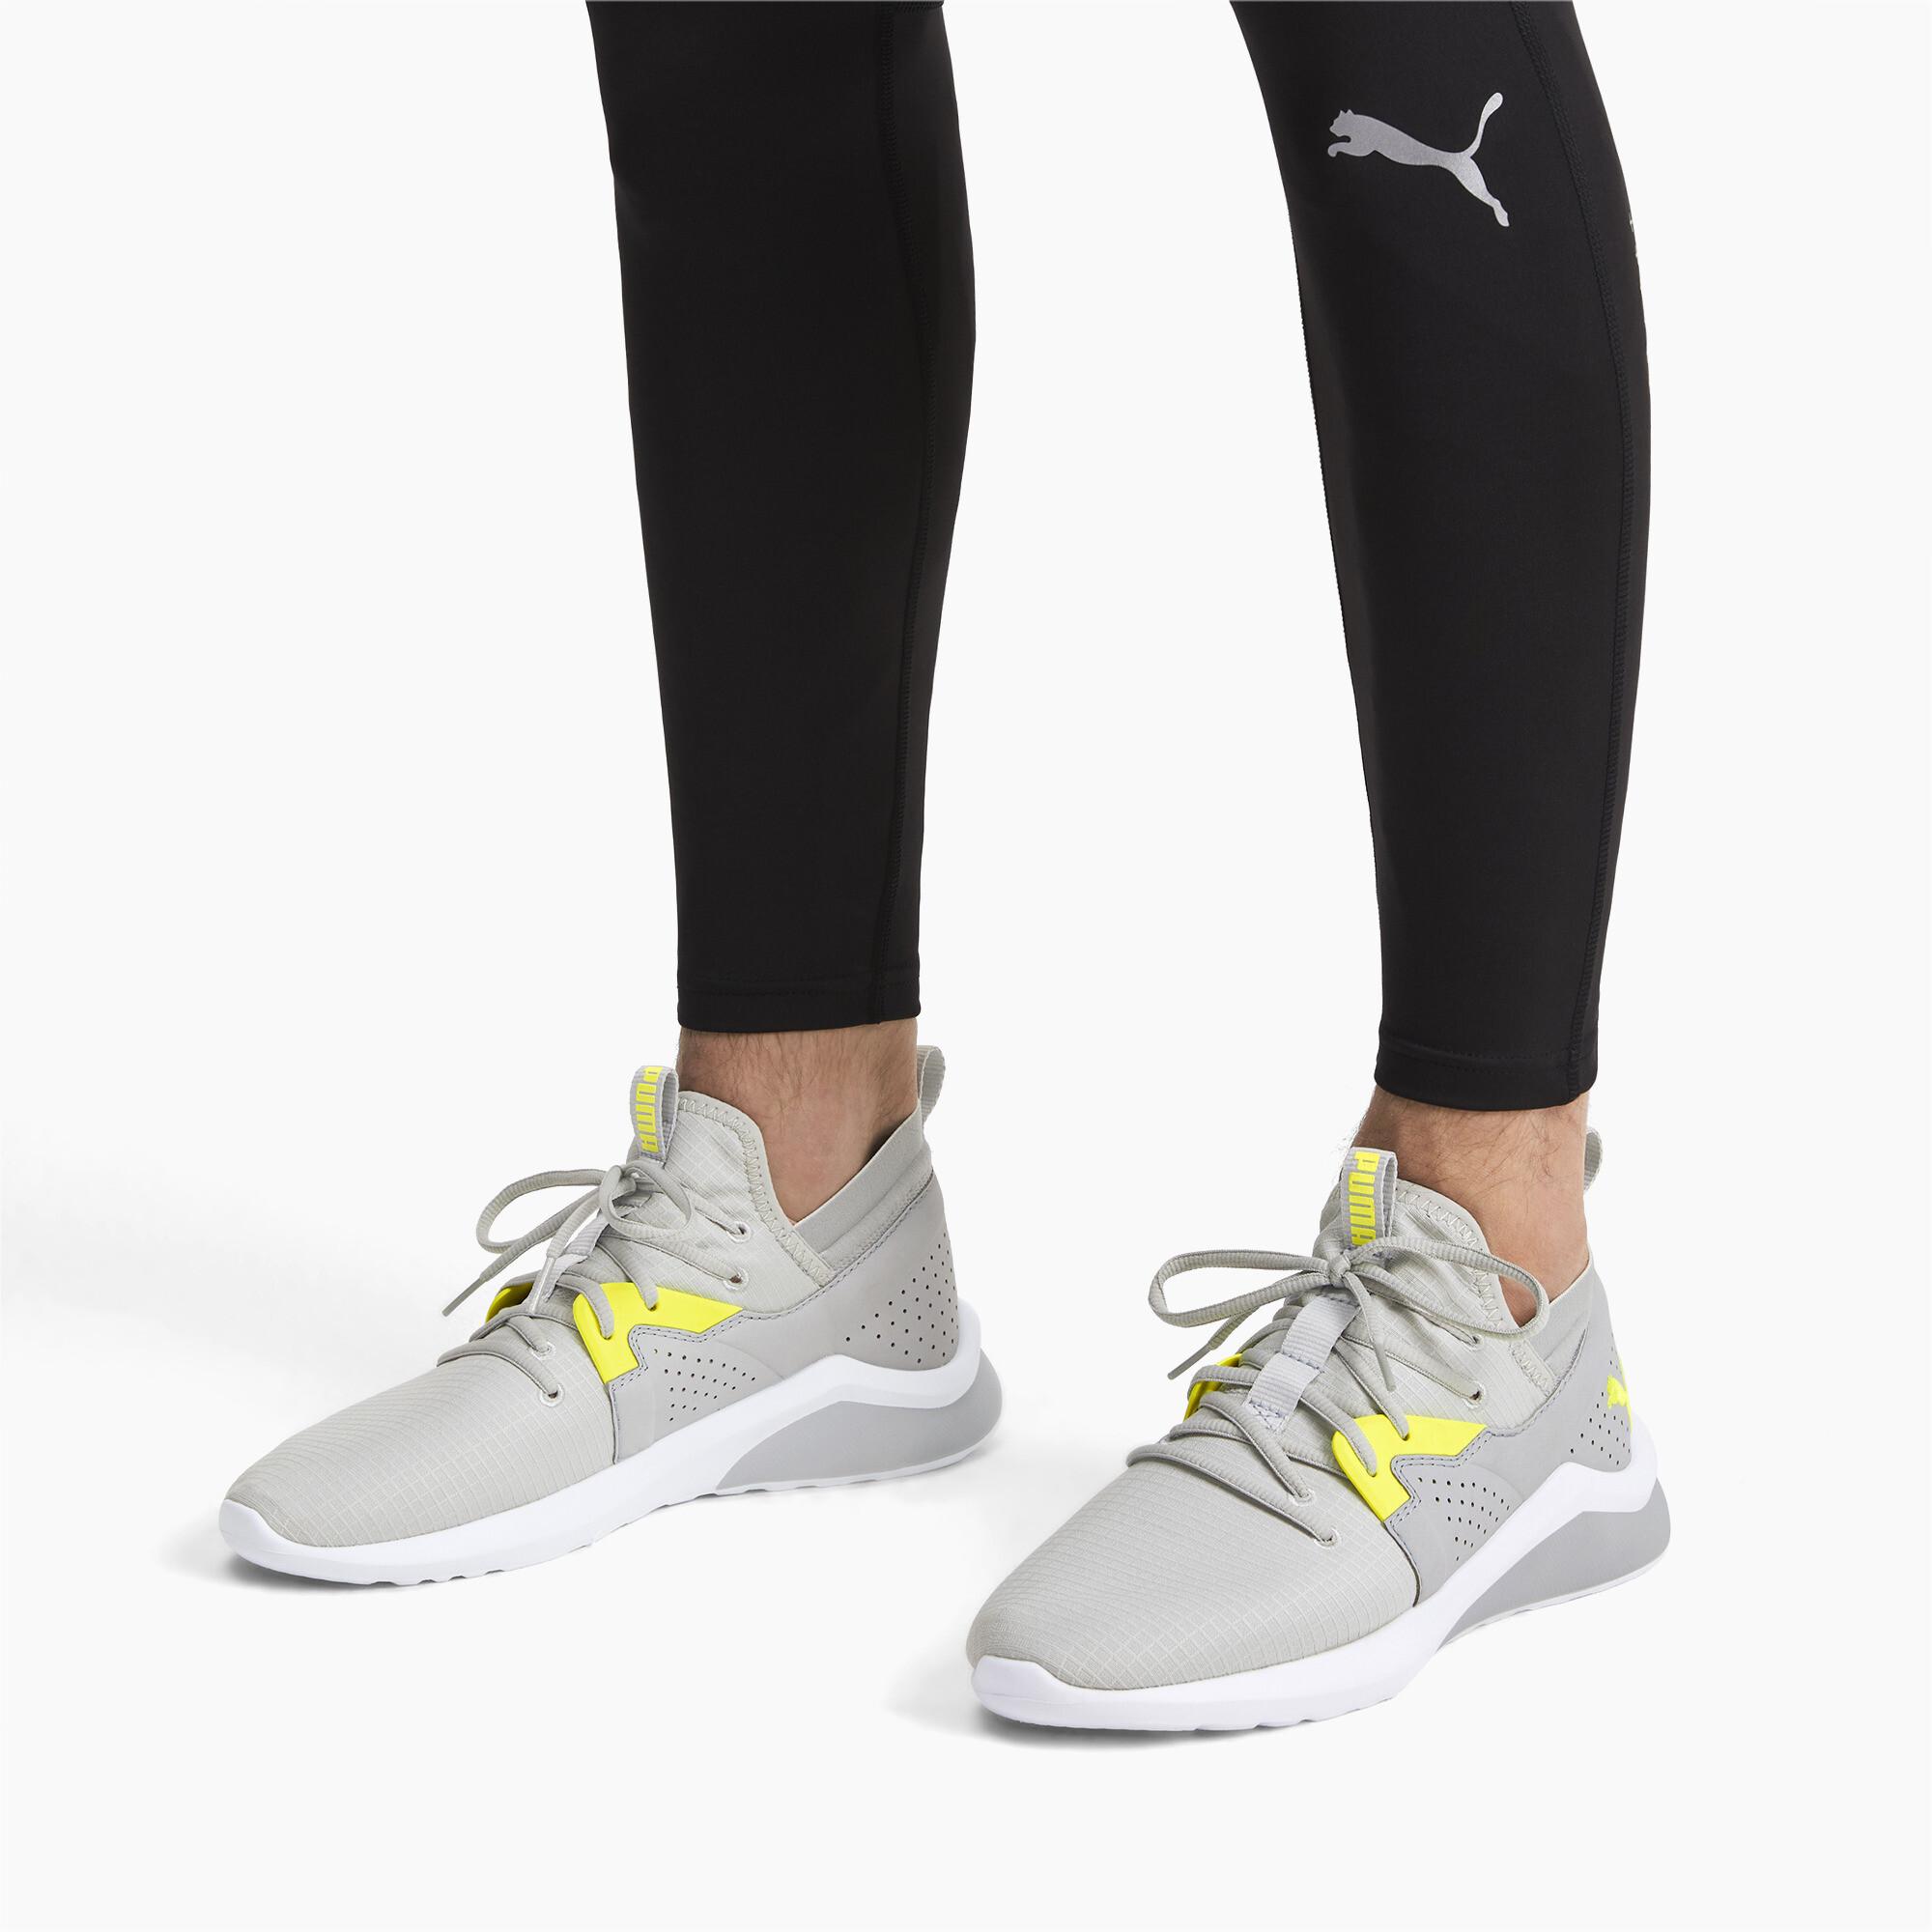 PUMA-Emergence-Lights-Men-039-s-Training-Shoes-Men-Shoe-Running thumbnail 5